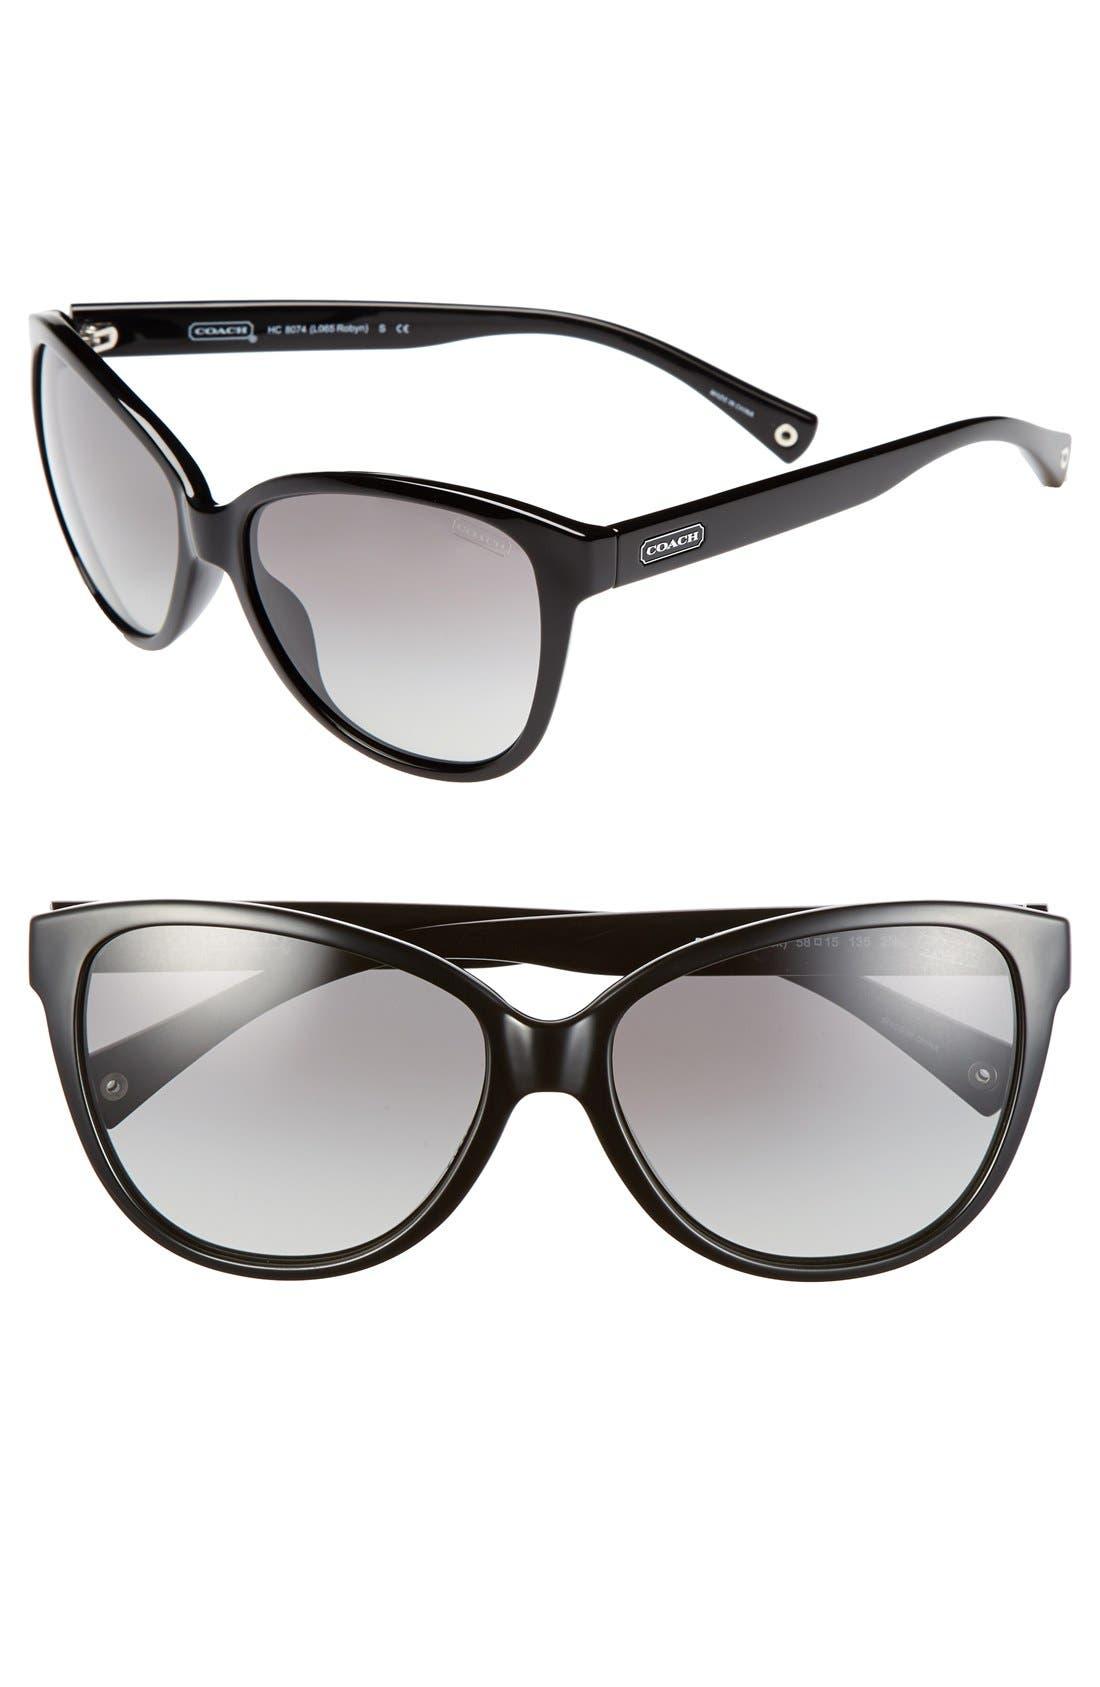 Alternate Image 1 Selected - COACH 58mm Cat Eye Sunglasses